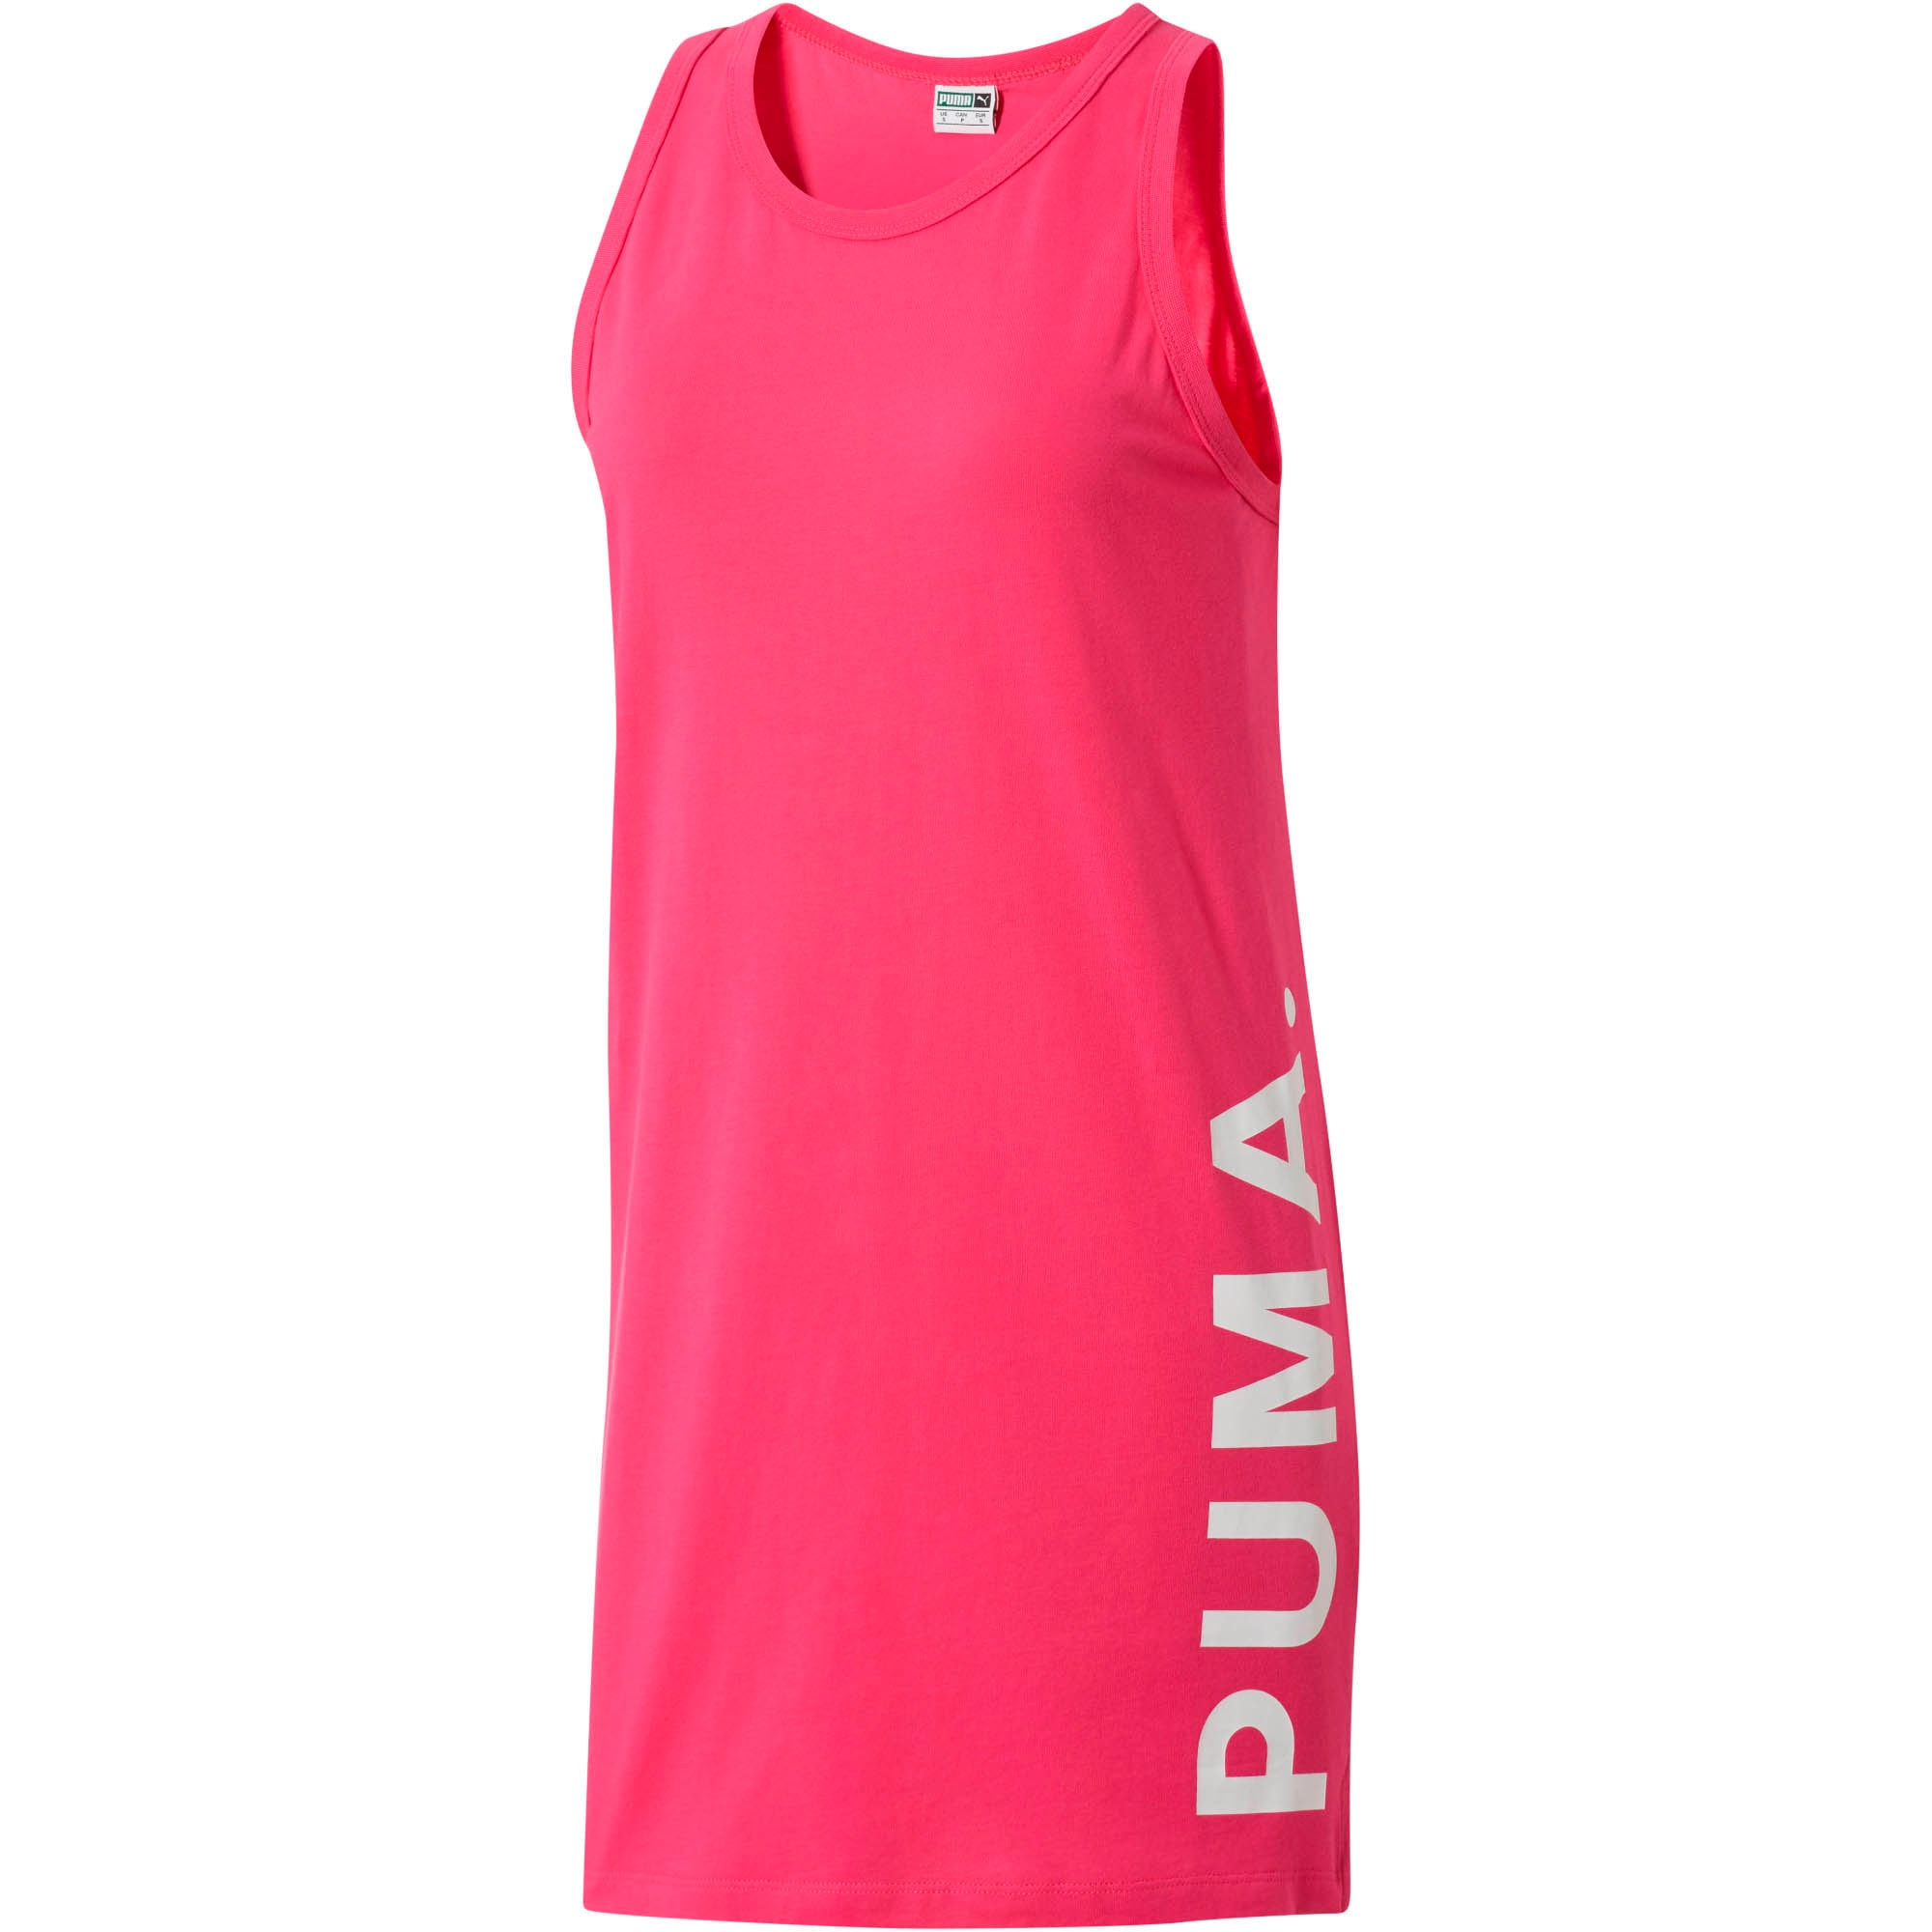 Miniatura 1 de Camiseta sin mangas Chase de mujer, Fuchsia Purple, mediano